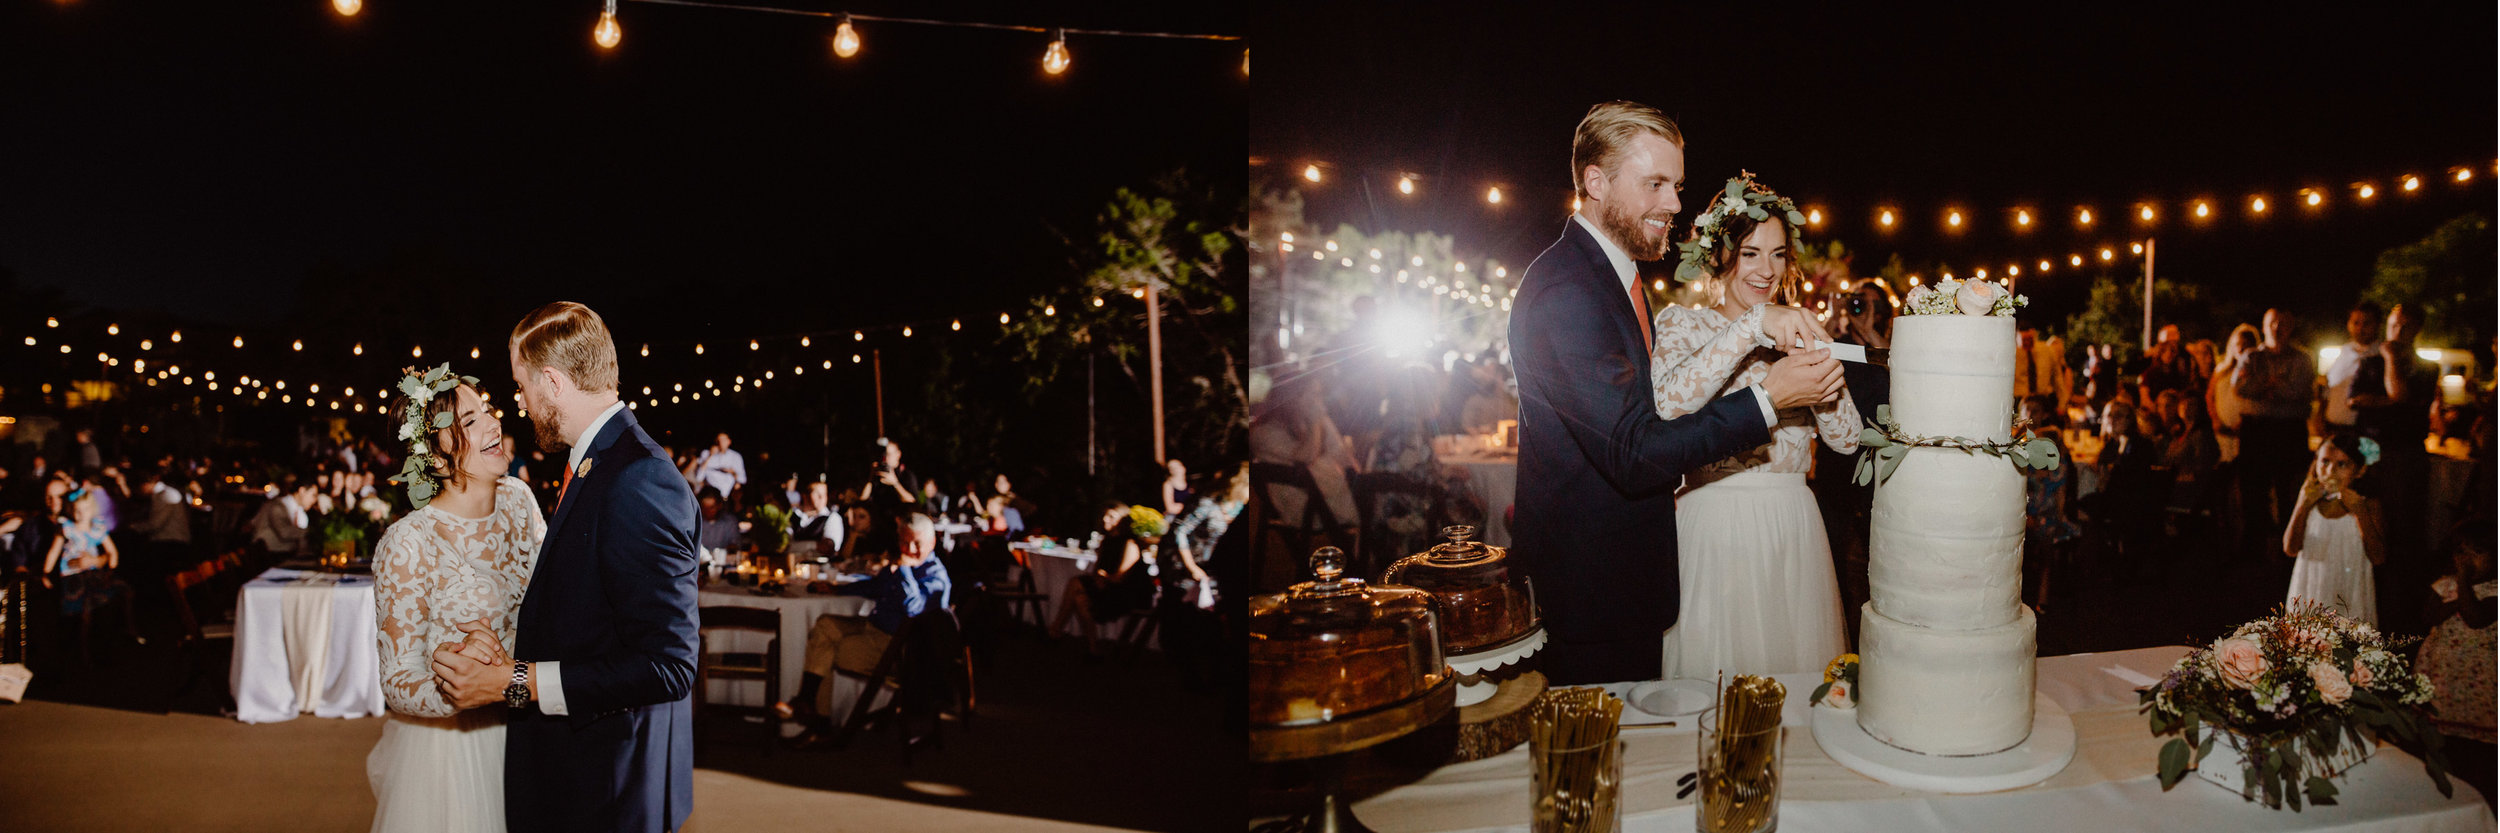 greenhouse-driftwood-wedding-14.jpg